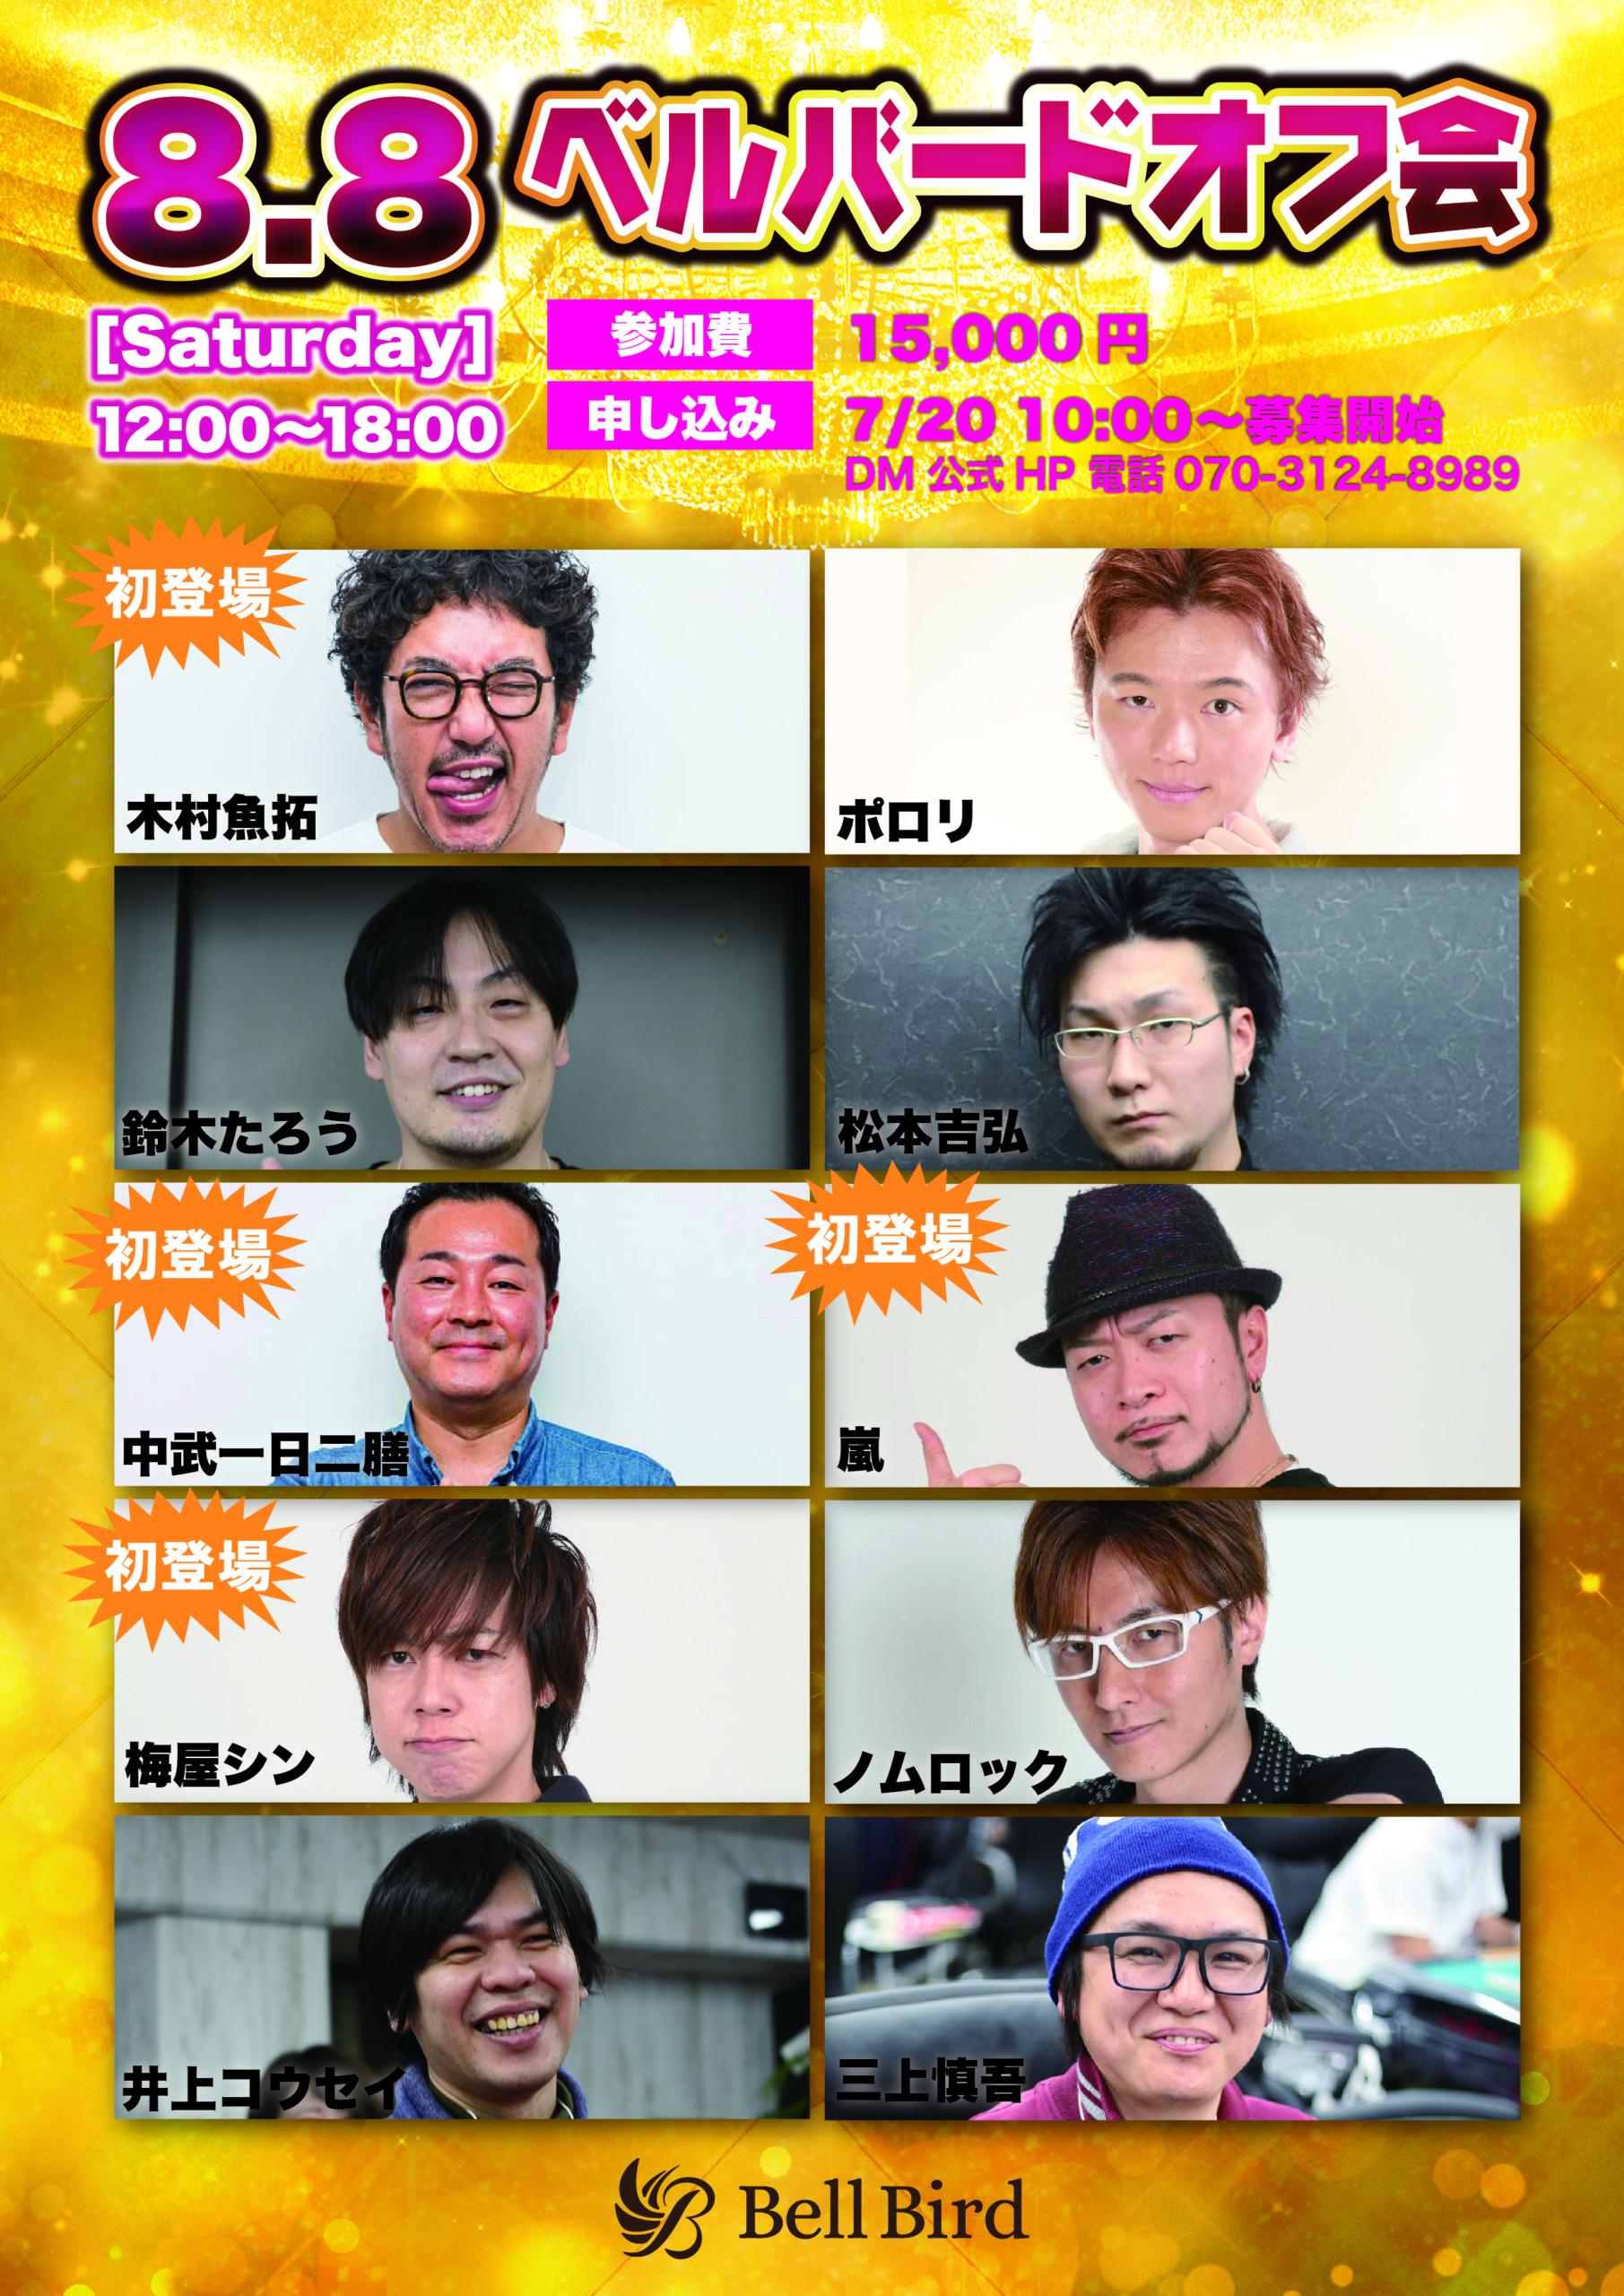 【オフ会】8月8日(土)決定!!